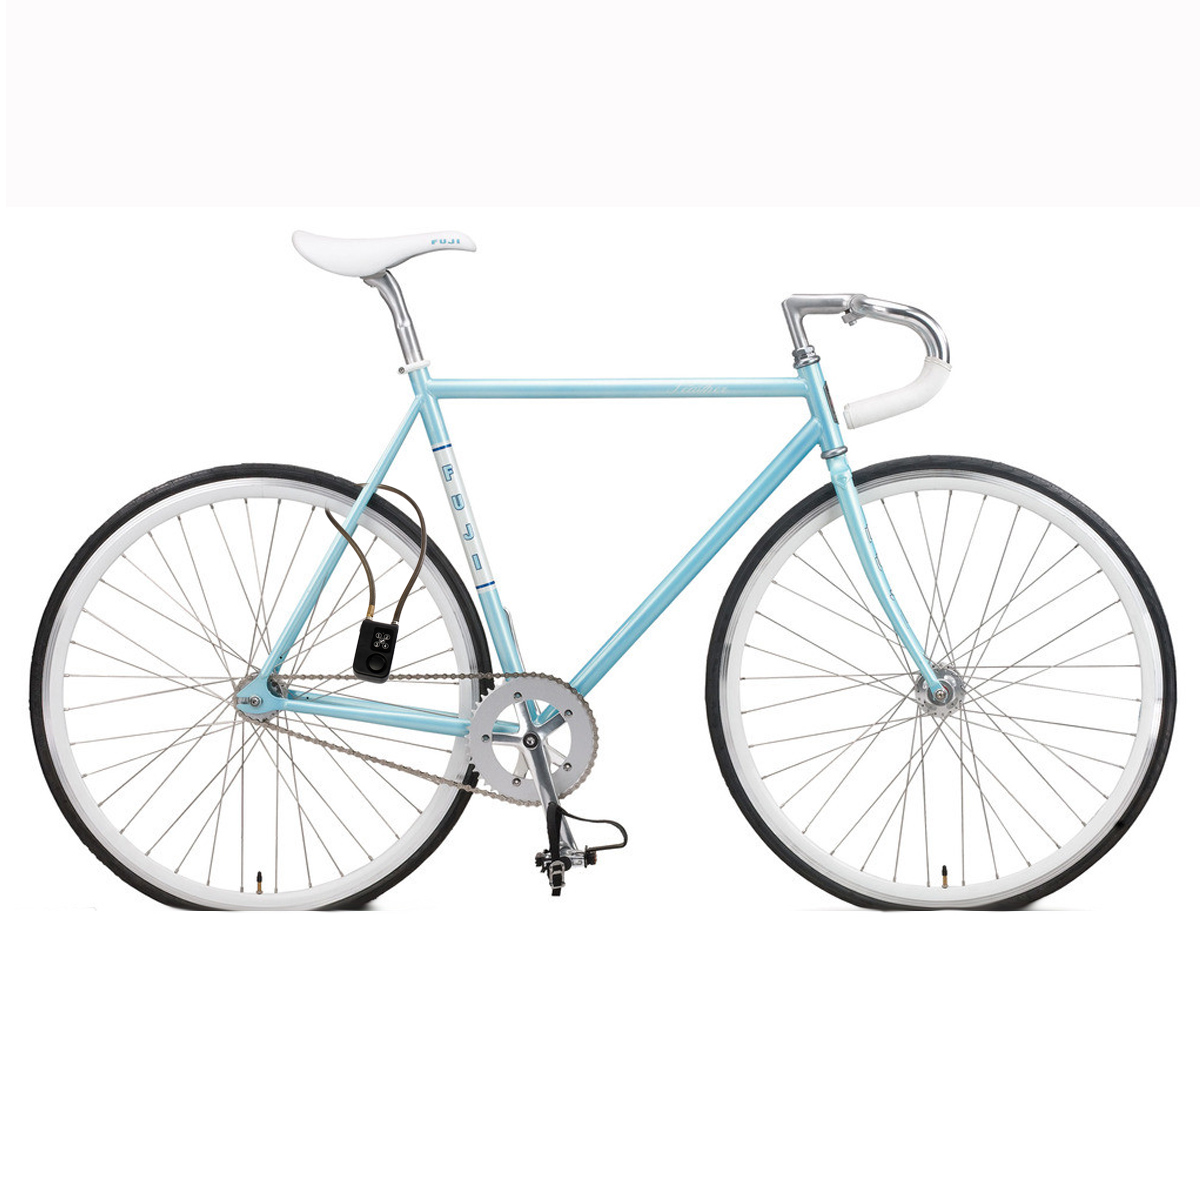 safe electric password anti theft security bicycle alarm lock chain bike guard